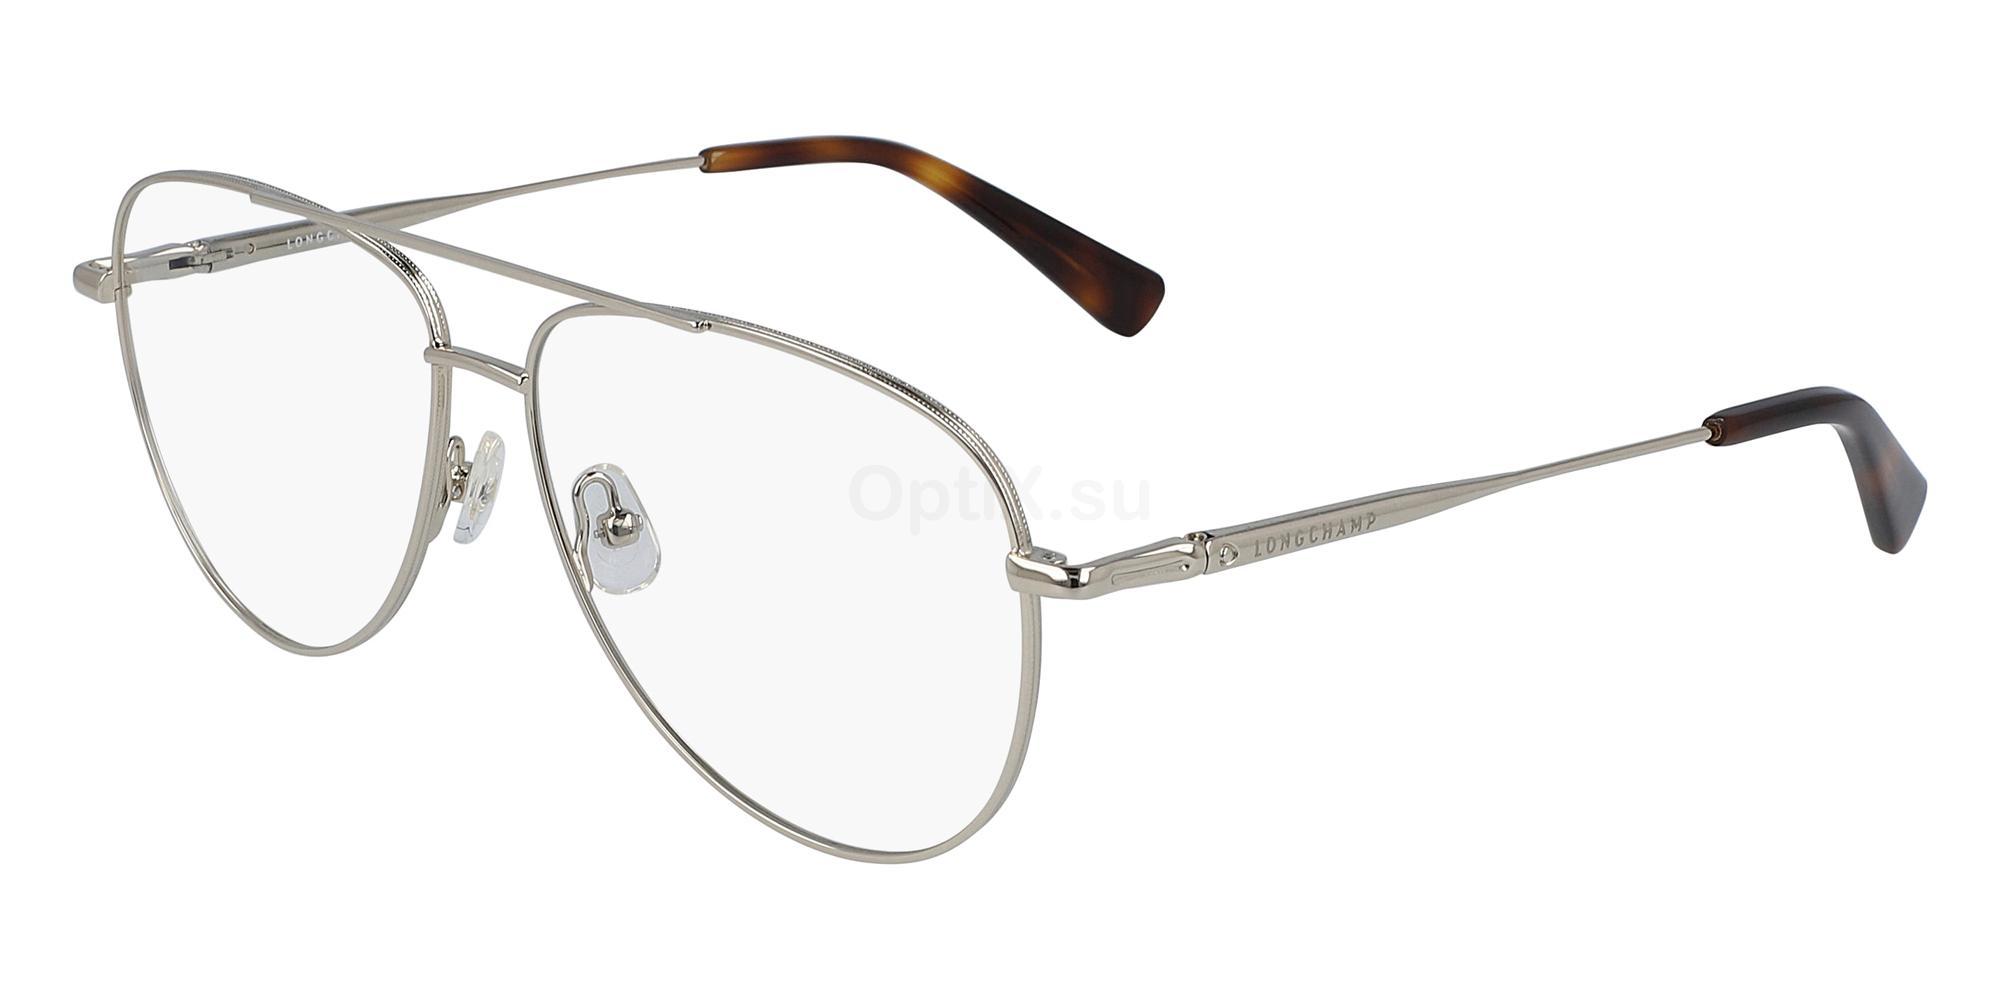 714 LO2119 Glasses, LONGCHAMP